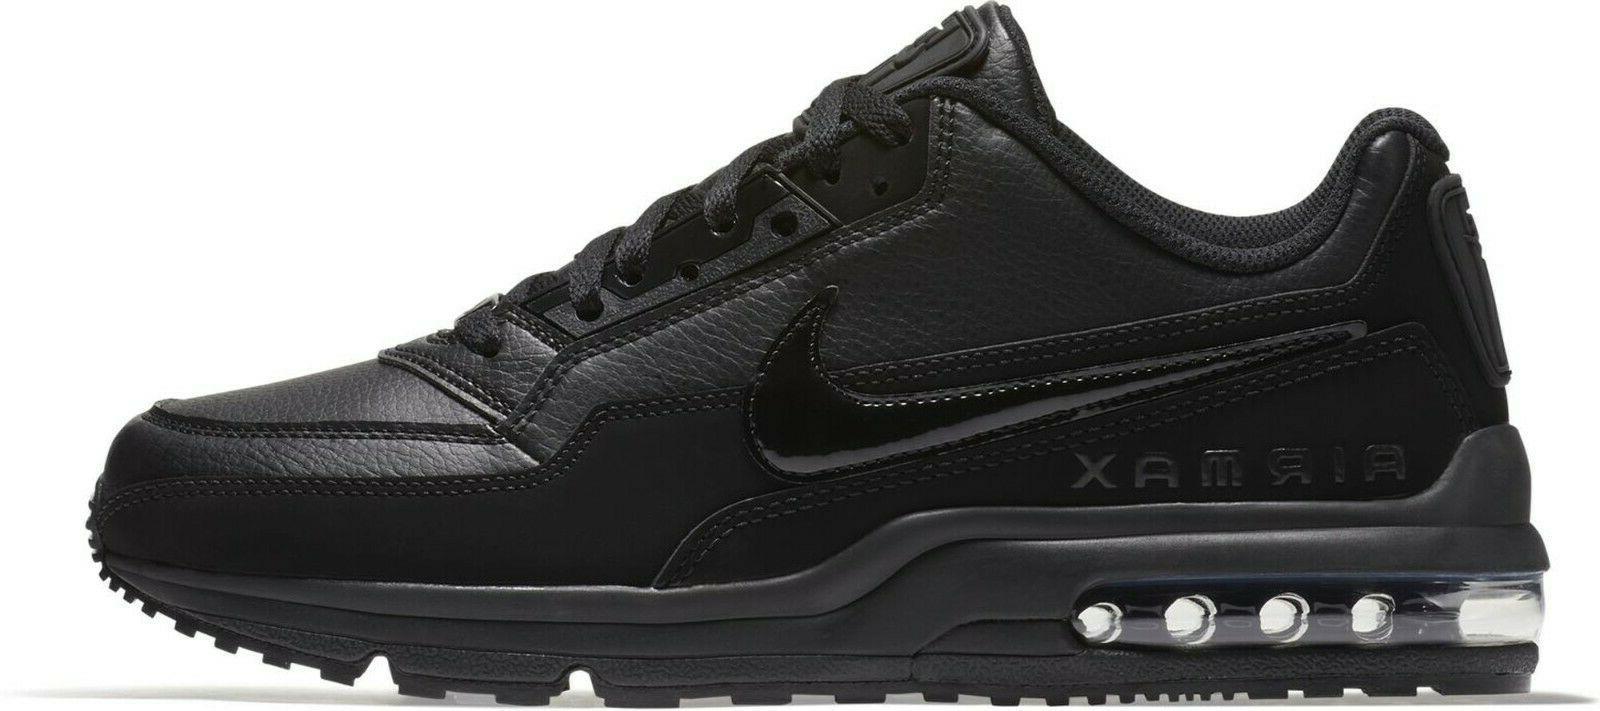 New NIKE Air Max LTD 3 Leather sneakers triple black